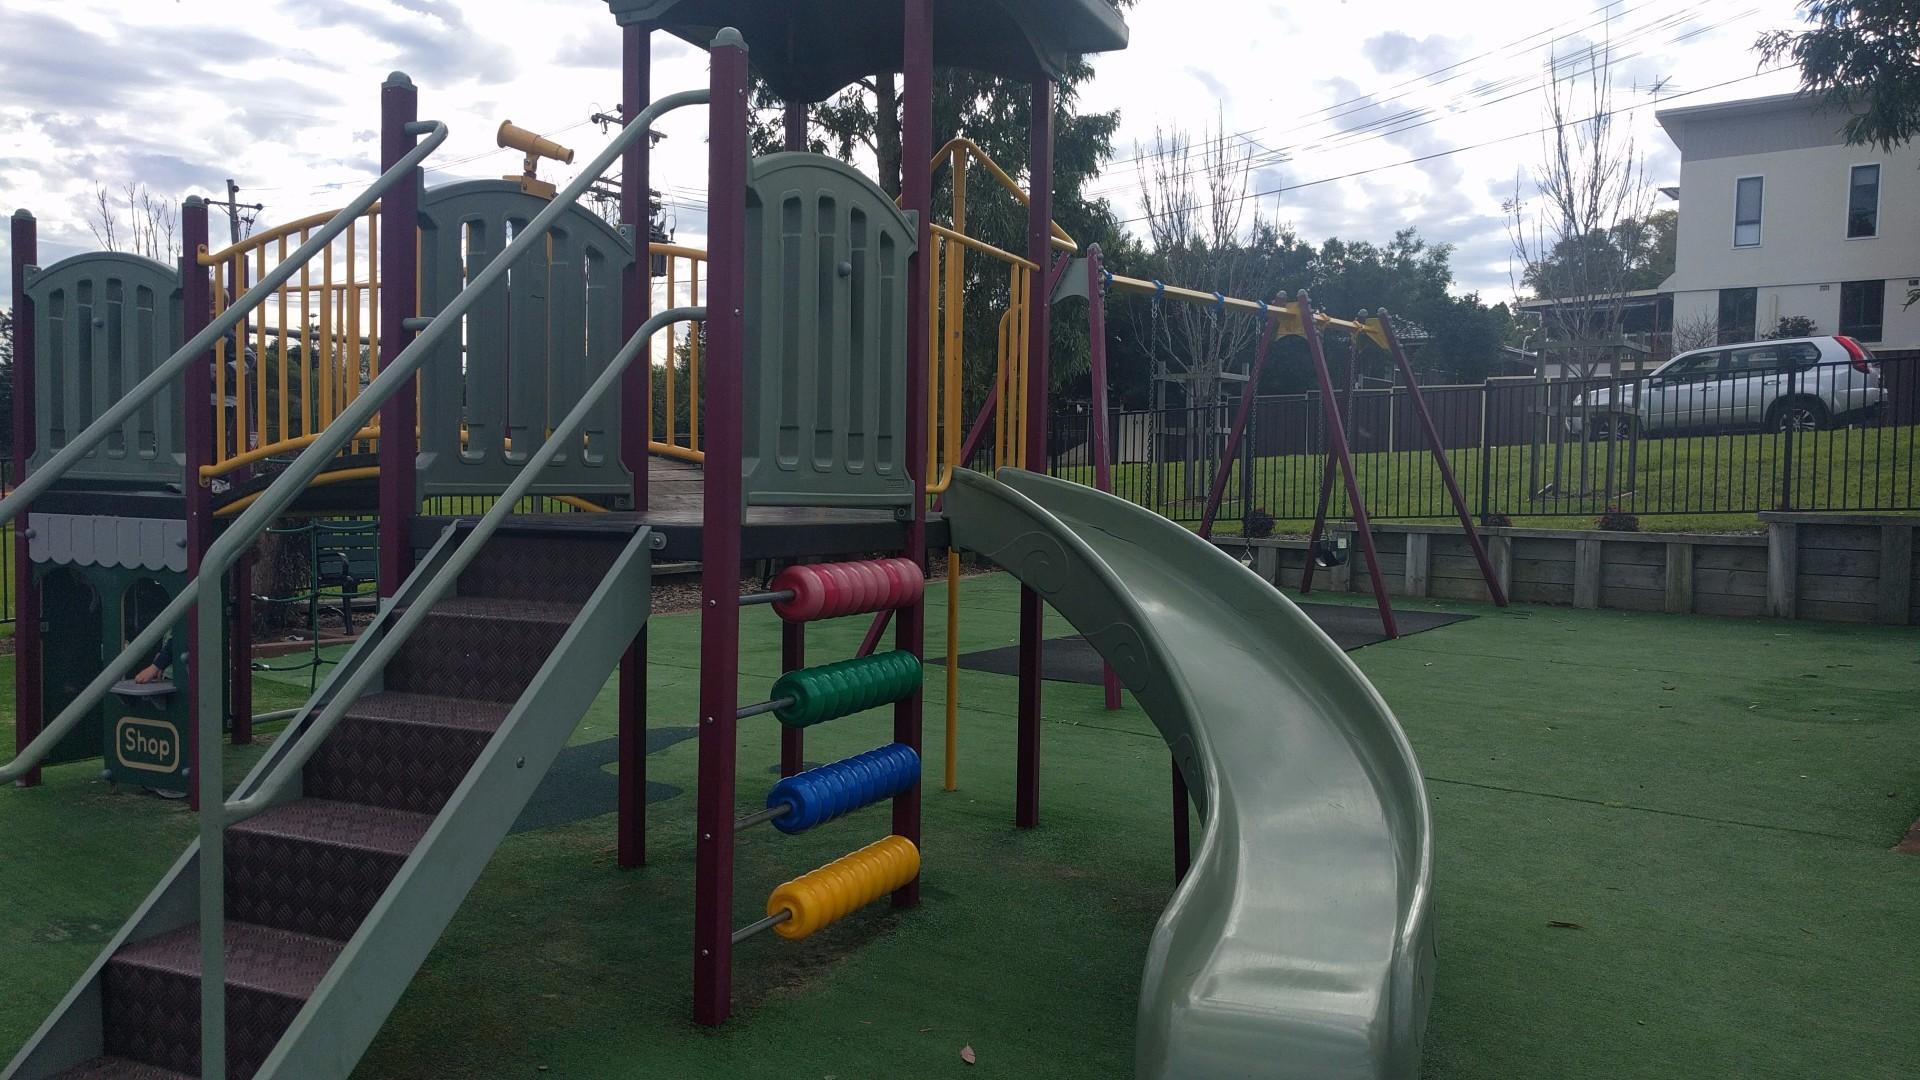 Bretby Park